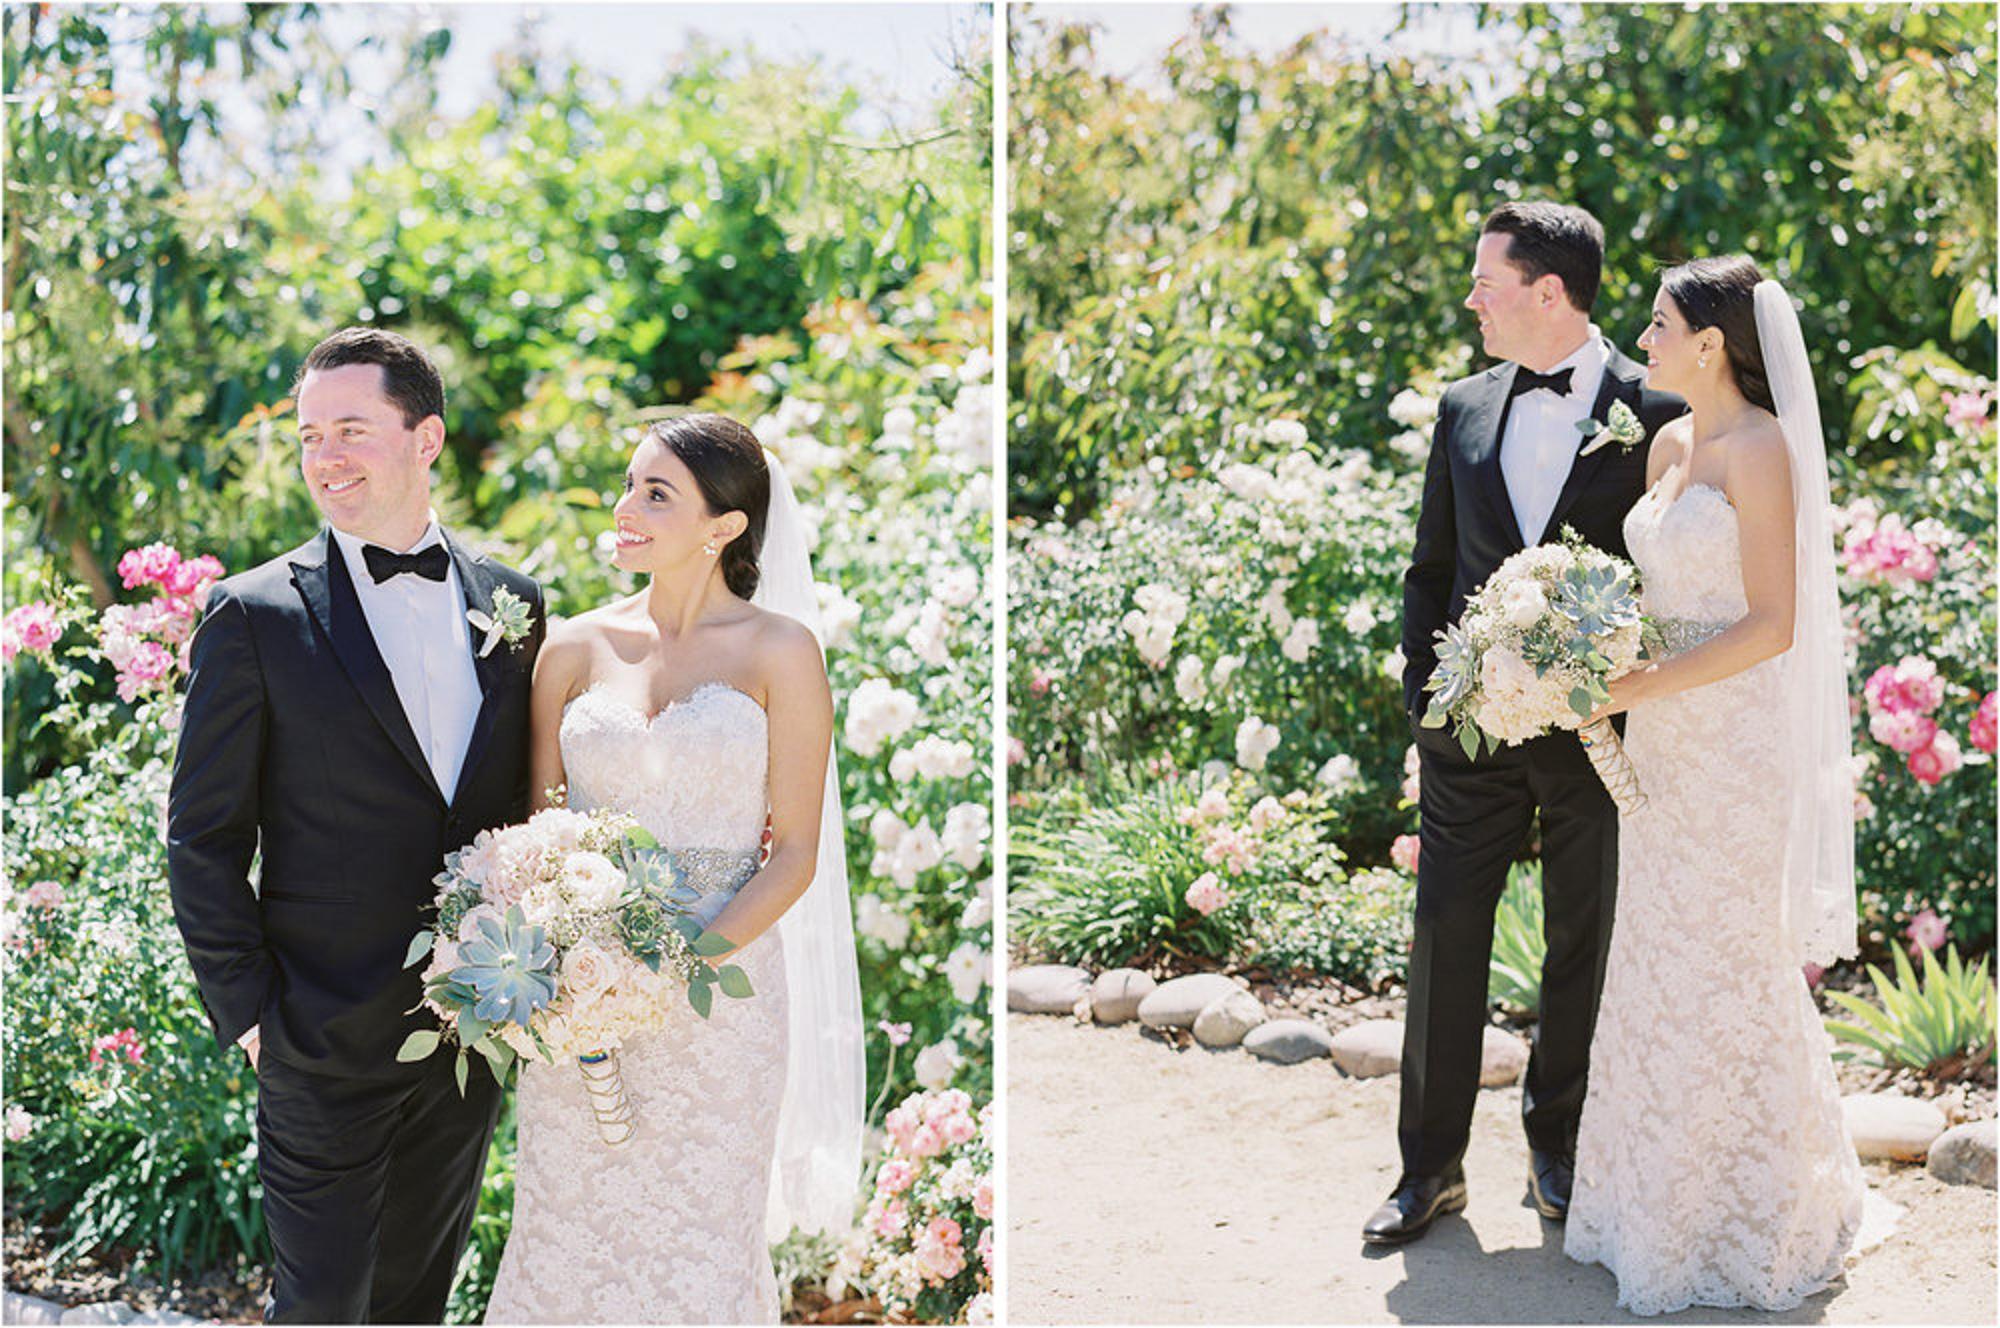 Gerry-Ranch-Wedding-Photography-Kristina-Adams-10.jpg